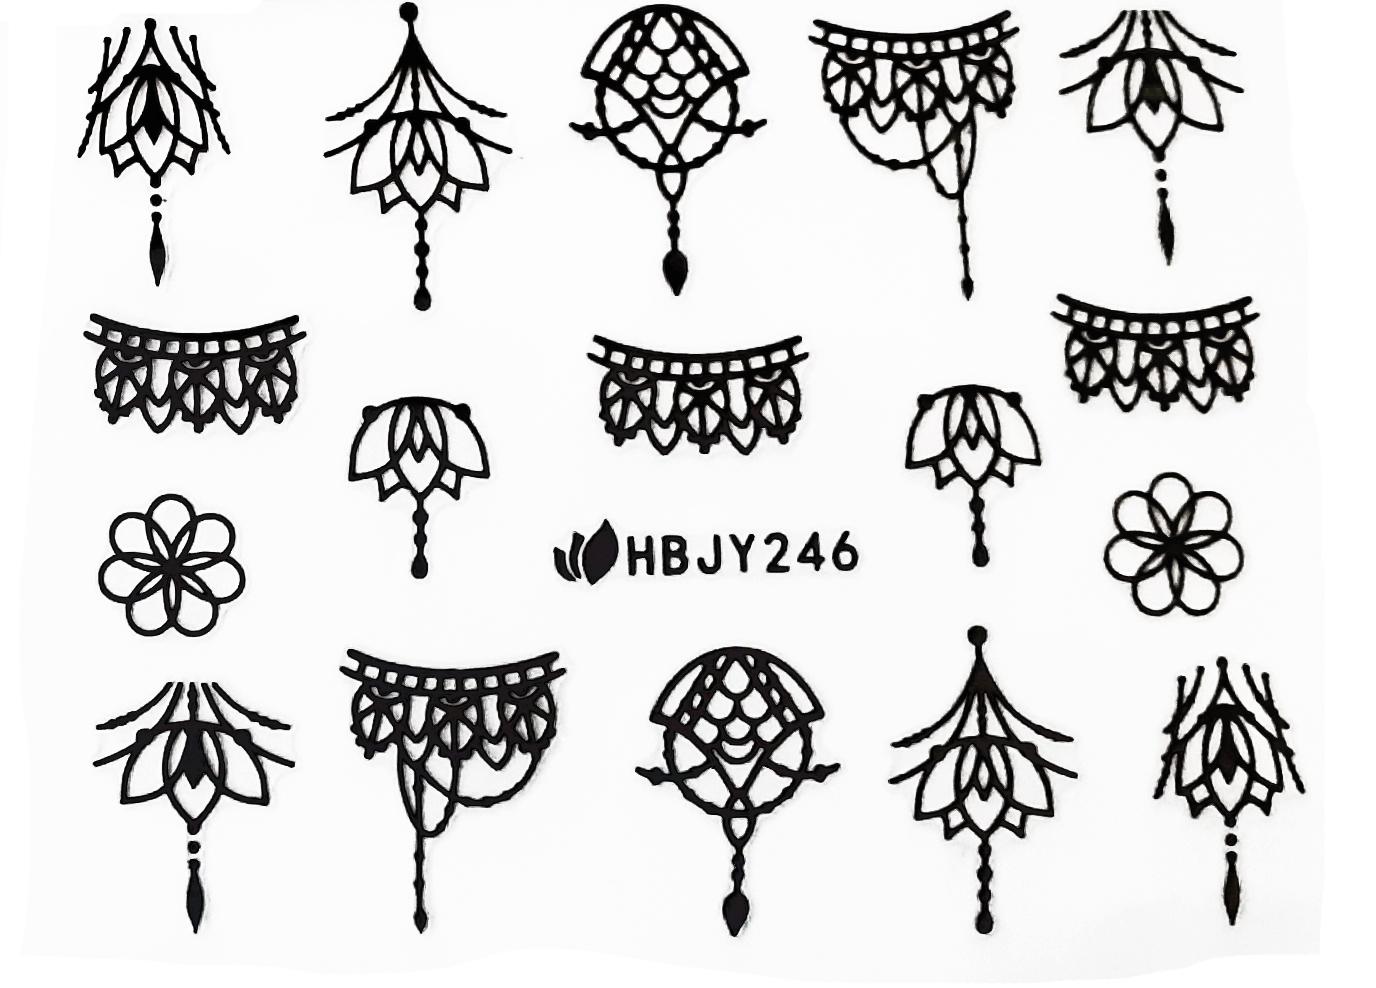 Sticker Ornamente HBJY-246 Mandalas schwarz